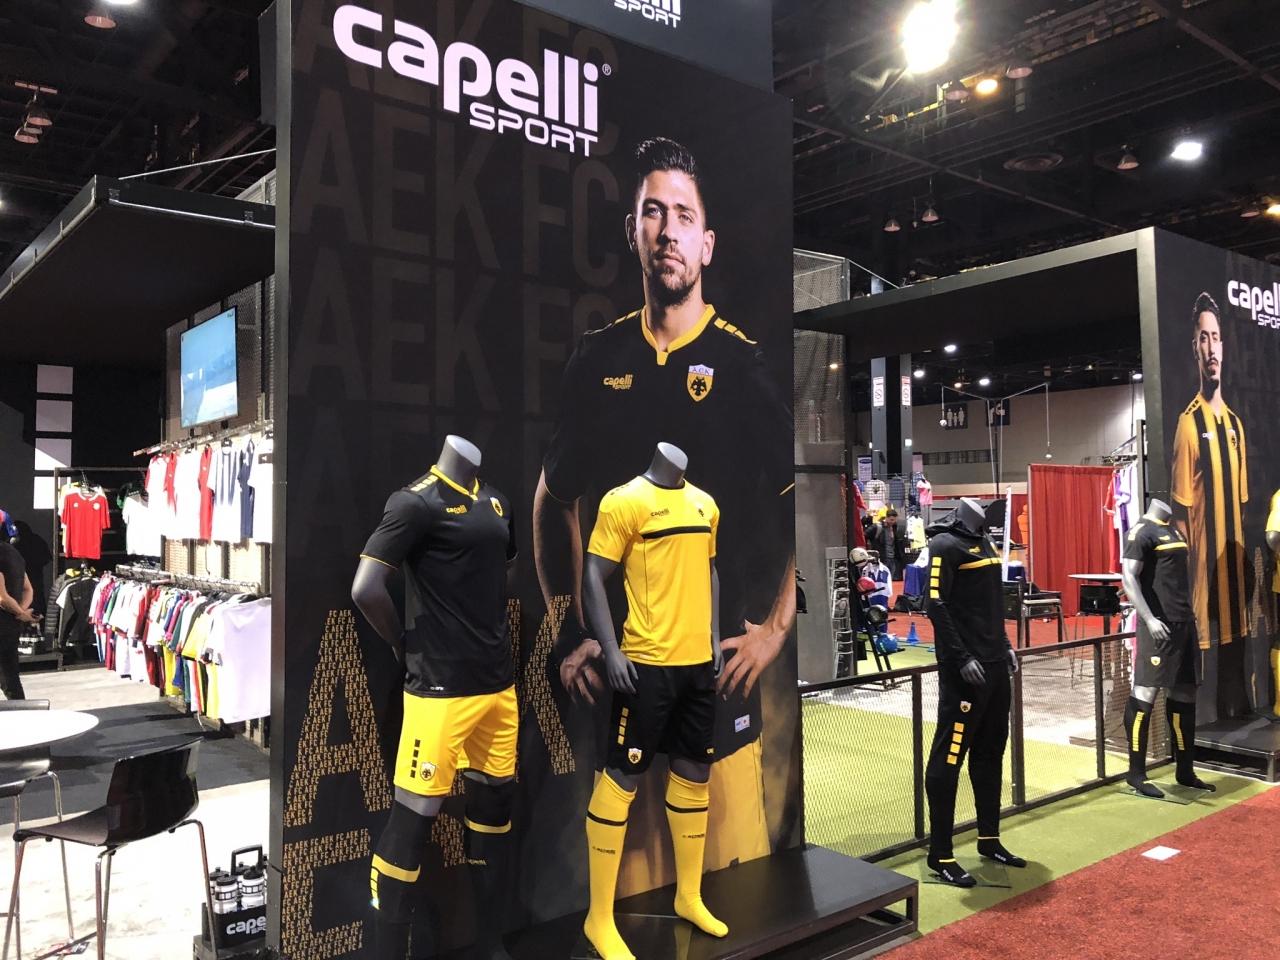 Futpost-Capelli Sport